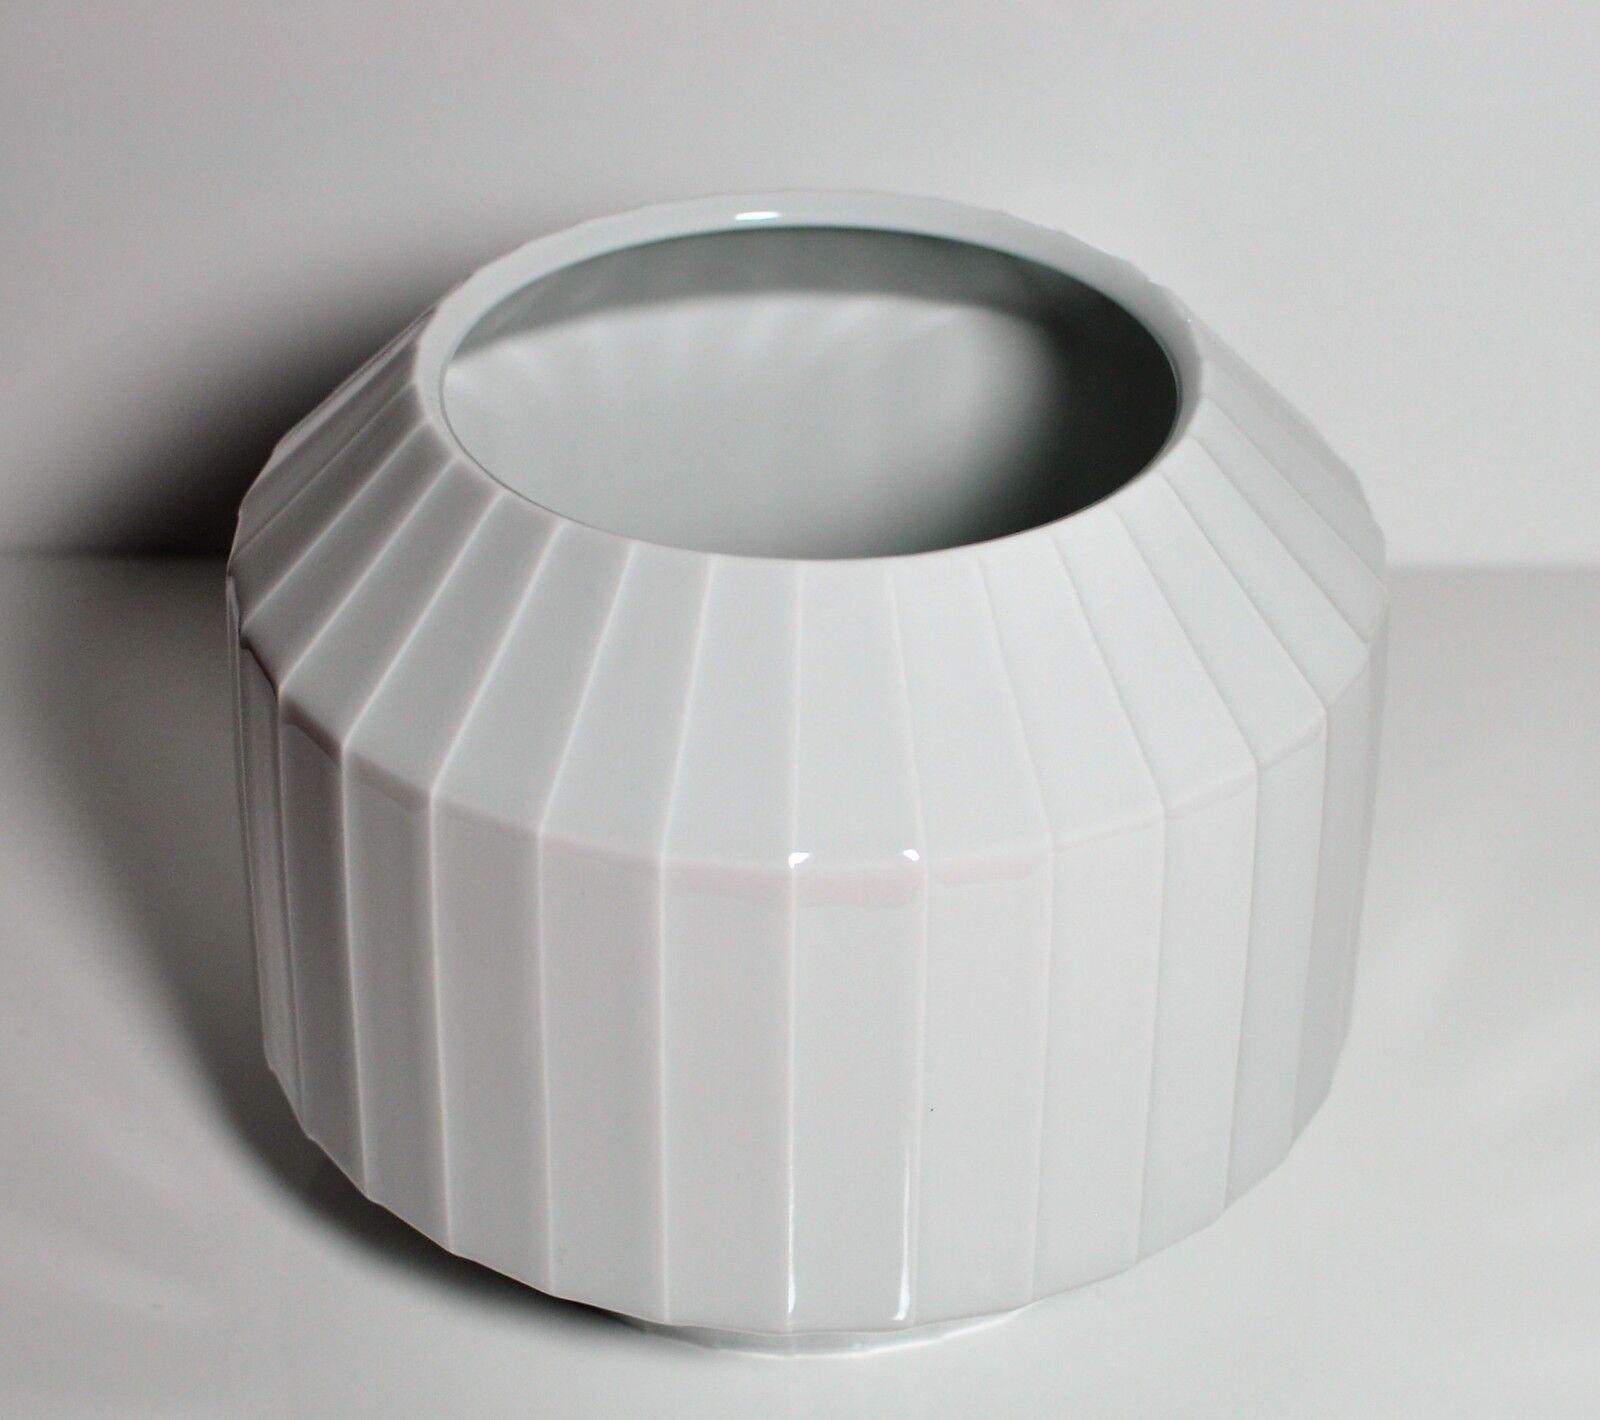 Rosenthal Studio-Line vase vase Studio-Line Hot Spots-blanc 16 cm NEUF de3b57